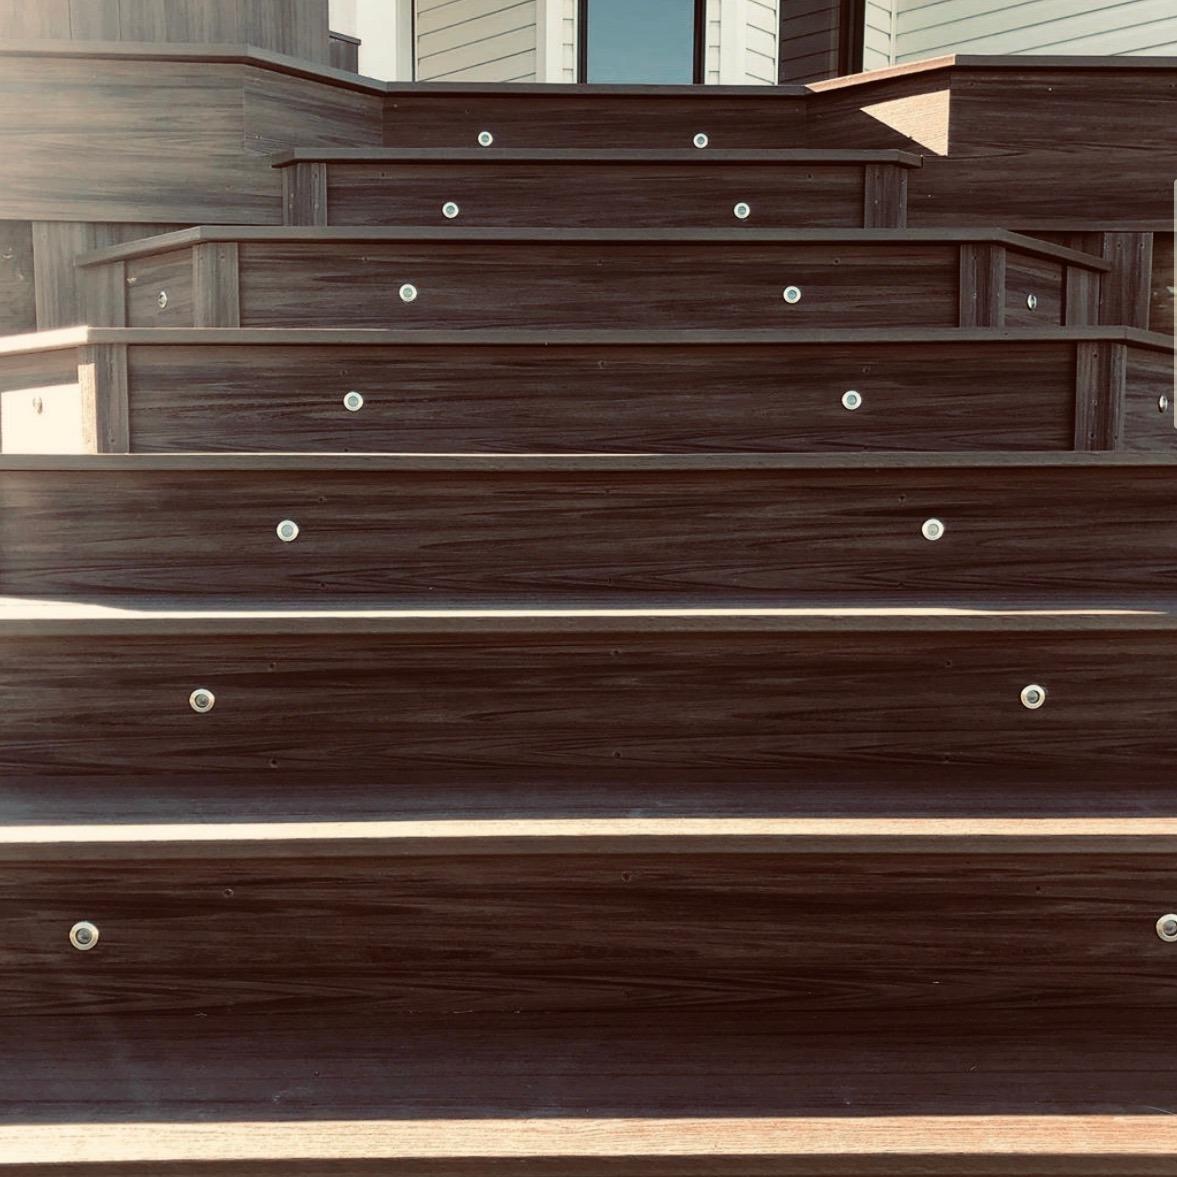 lighting installed in composite decking